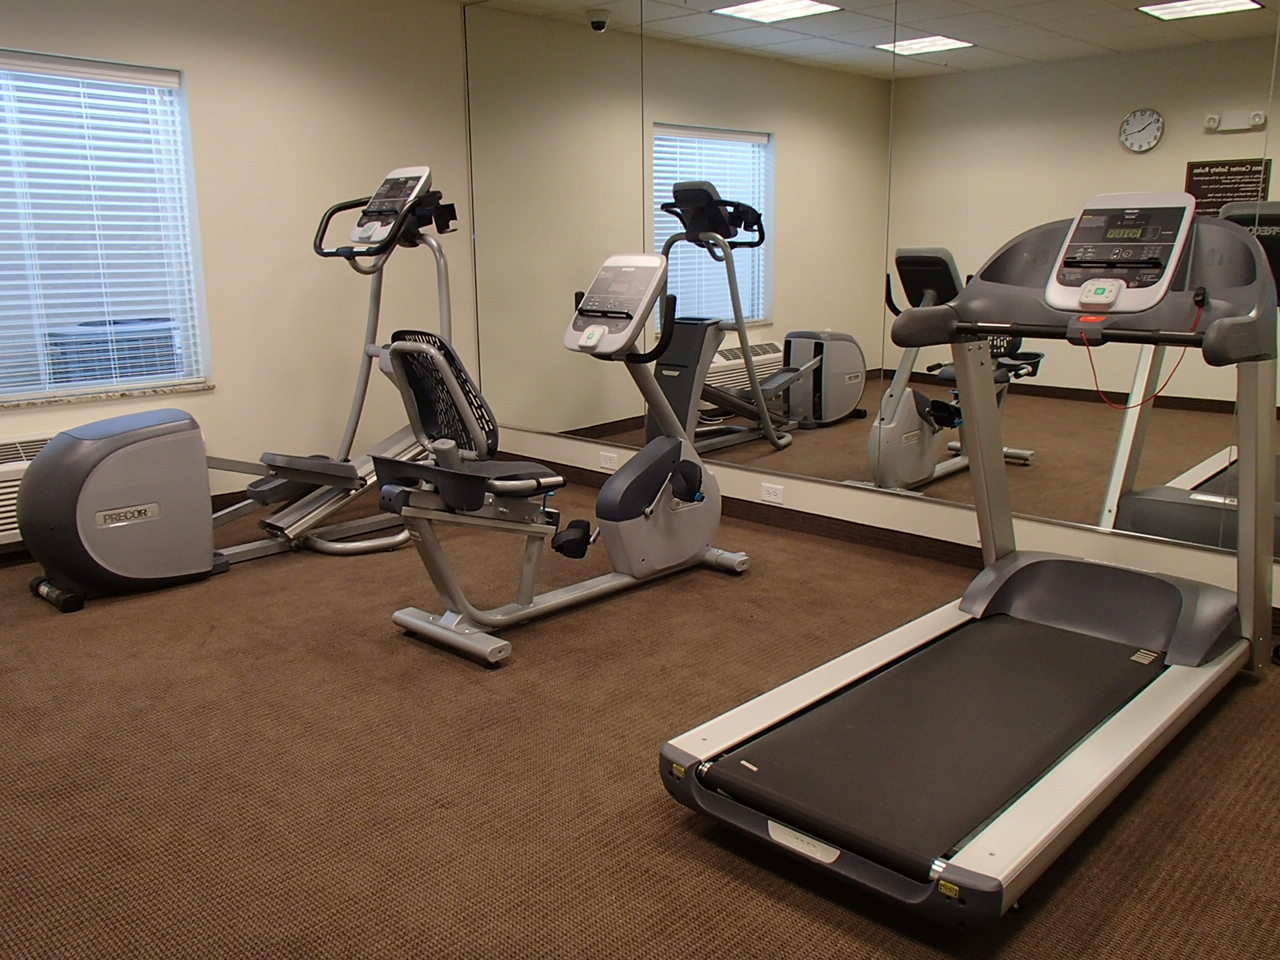 Sleep Inn Emerson Georgia fitness center